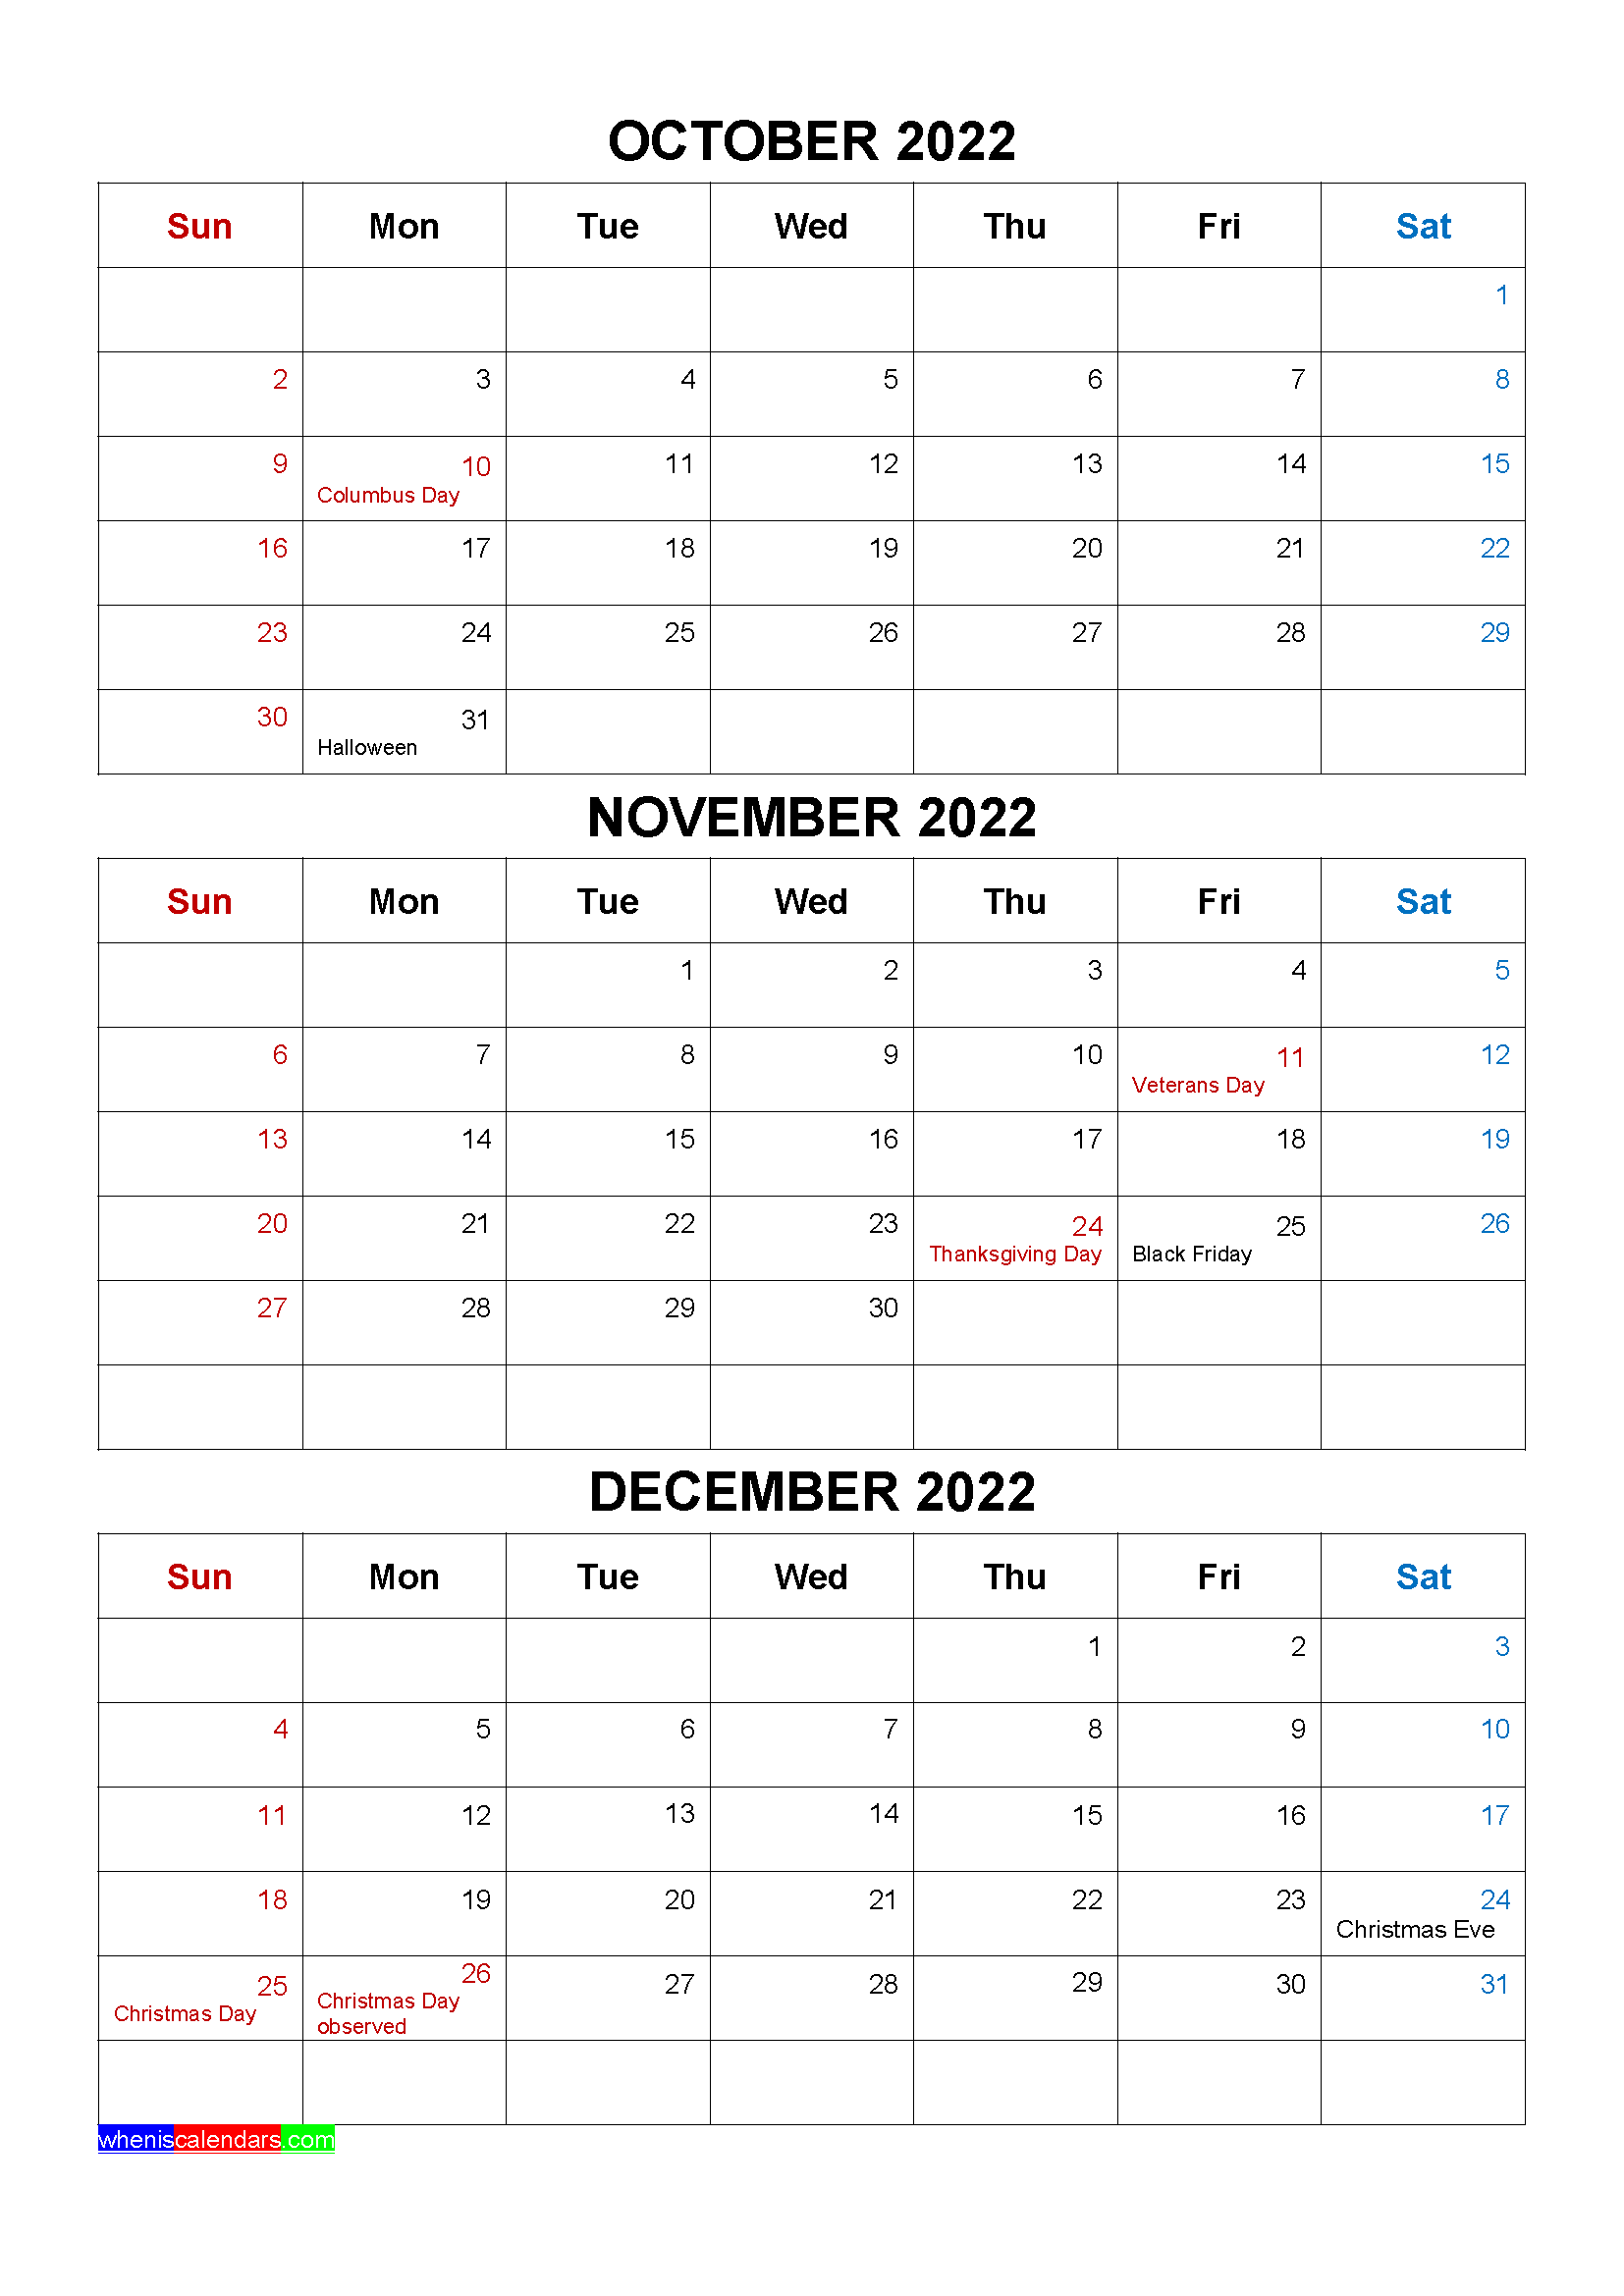 Printable December 2022 Calendar Word.Free October November December 2022 Calendar With Holidays Four Quarters Calendar Printables Calendar Template Free Printable Calendar